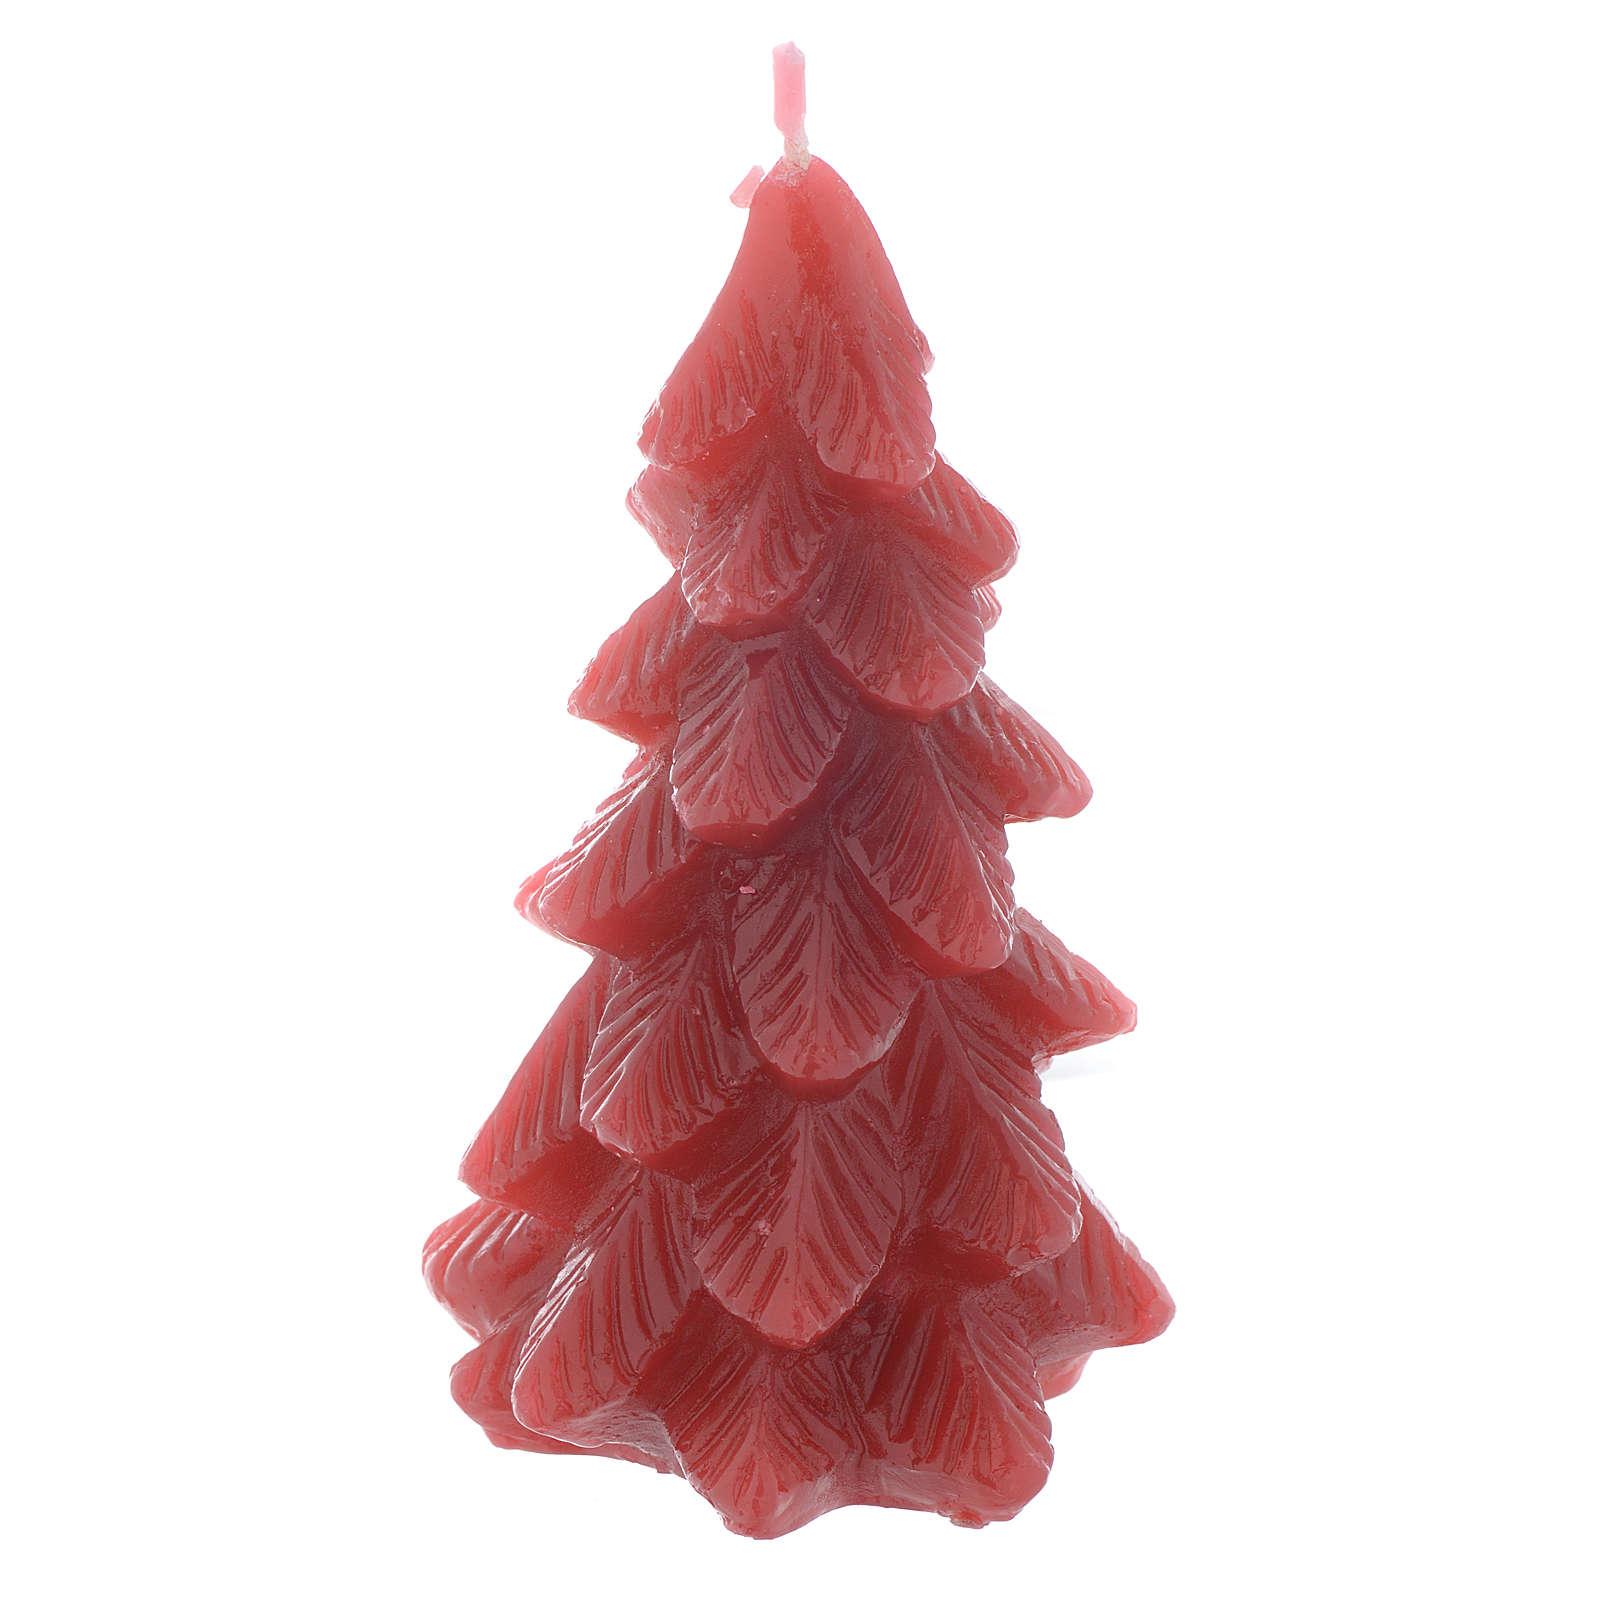 Bougie Sapin de Noël 11 cm rouge 3